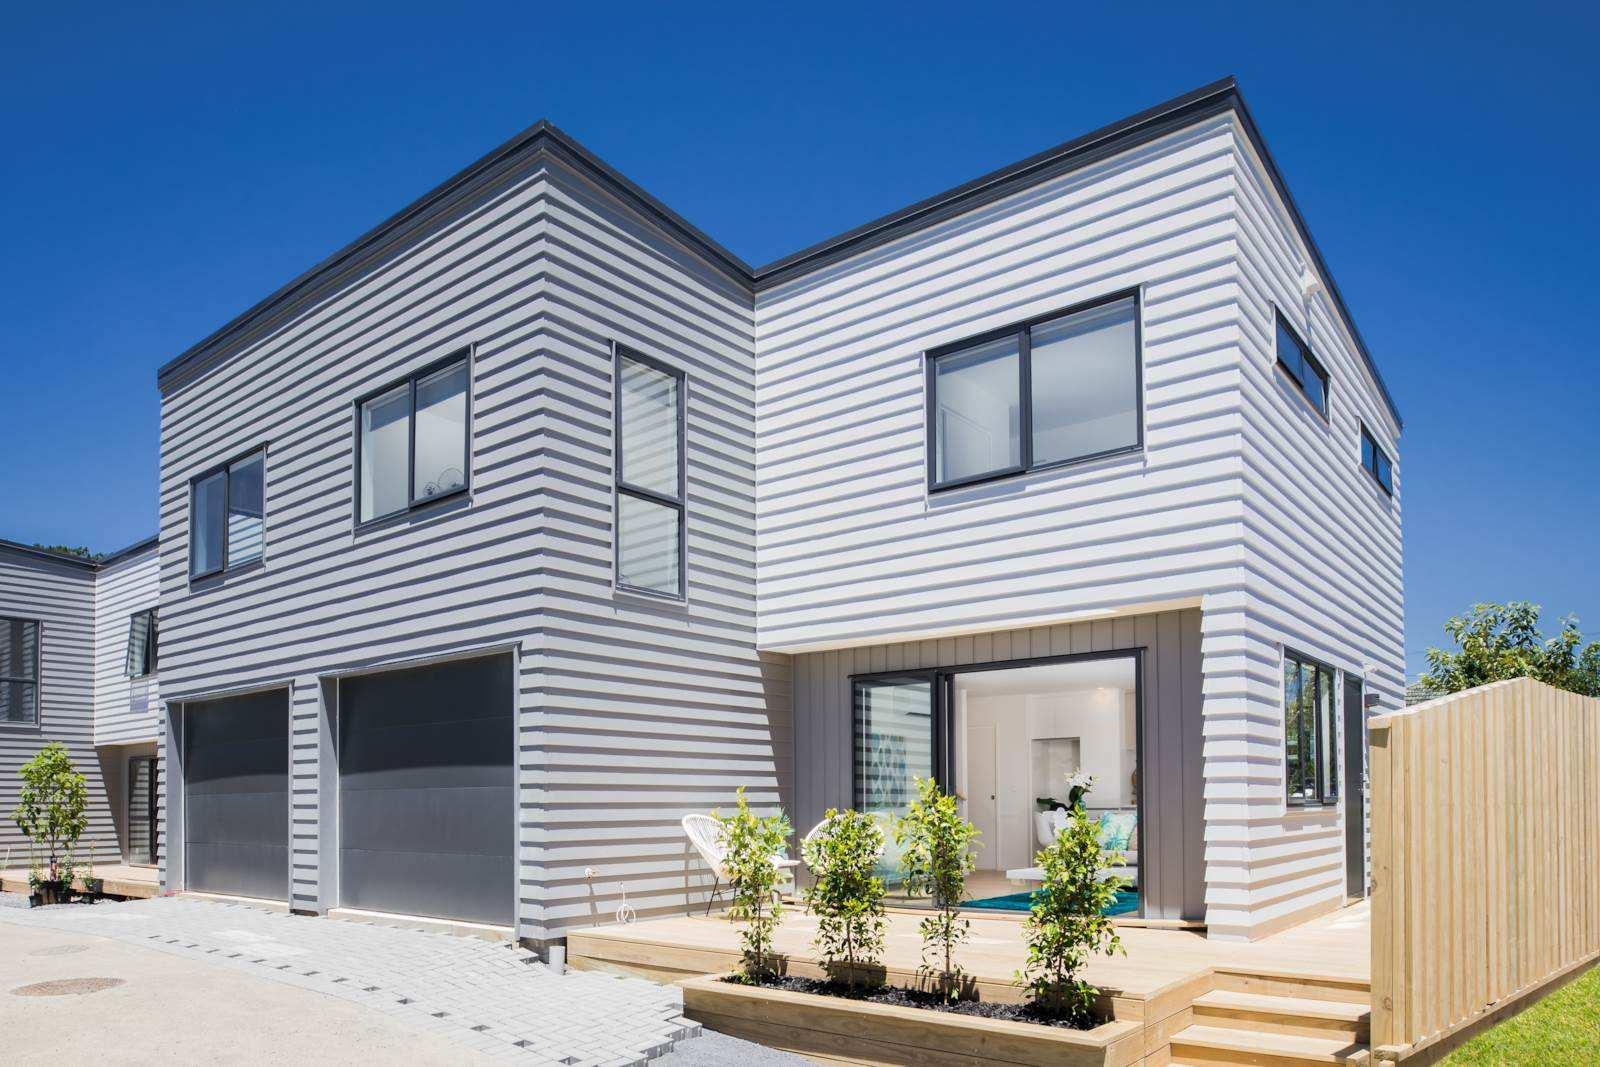 Sunnyvale 3房 全新北向阳光舒居 高端家装令人心动 步行至车站 享繁华商圈 邂逅梦想中的生活! Brand New Home!